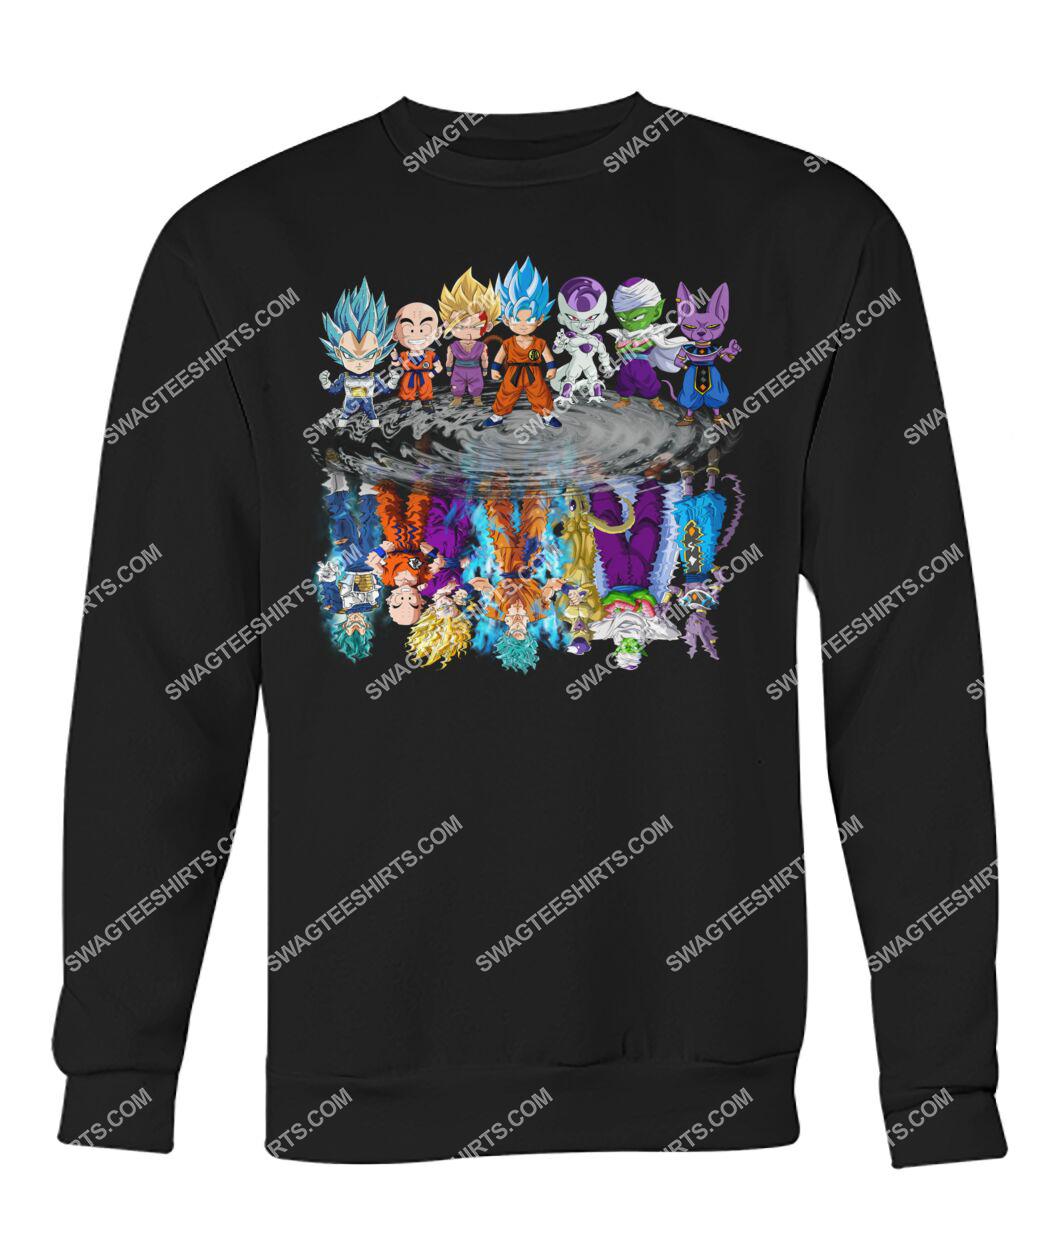 dragon ball z characters chibi water reflection sweatshirt 1